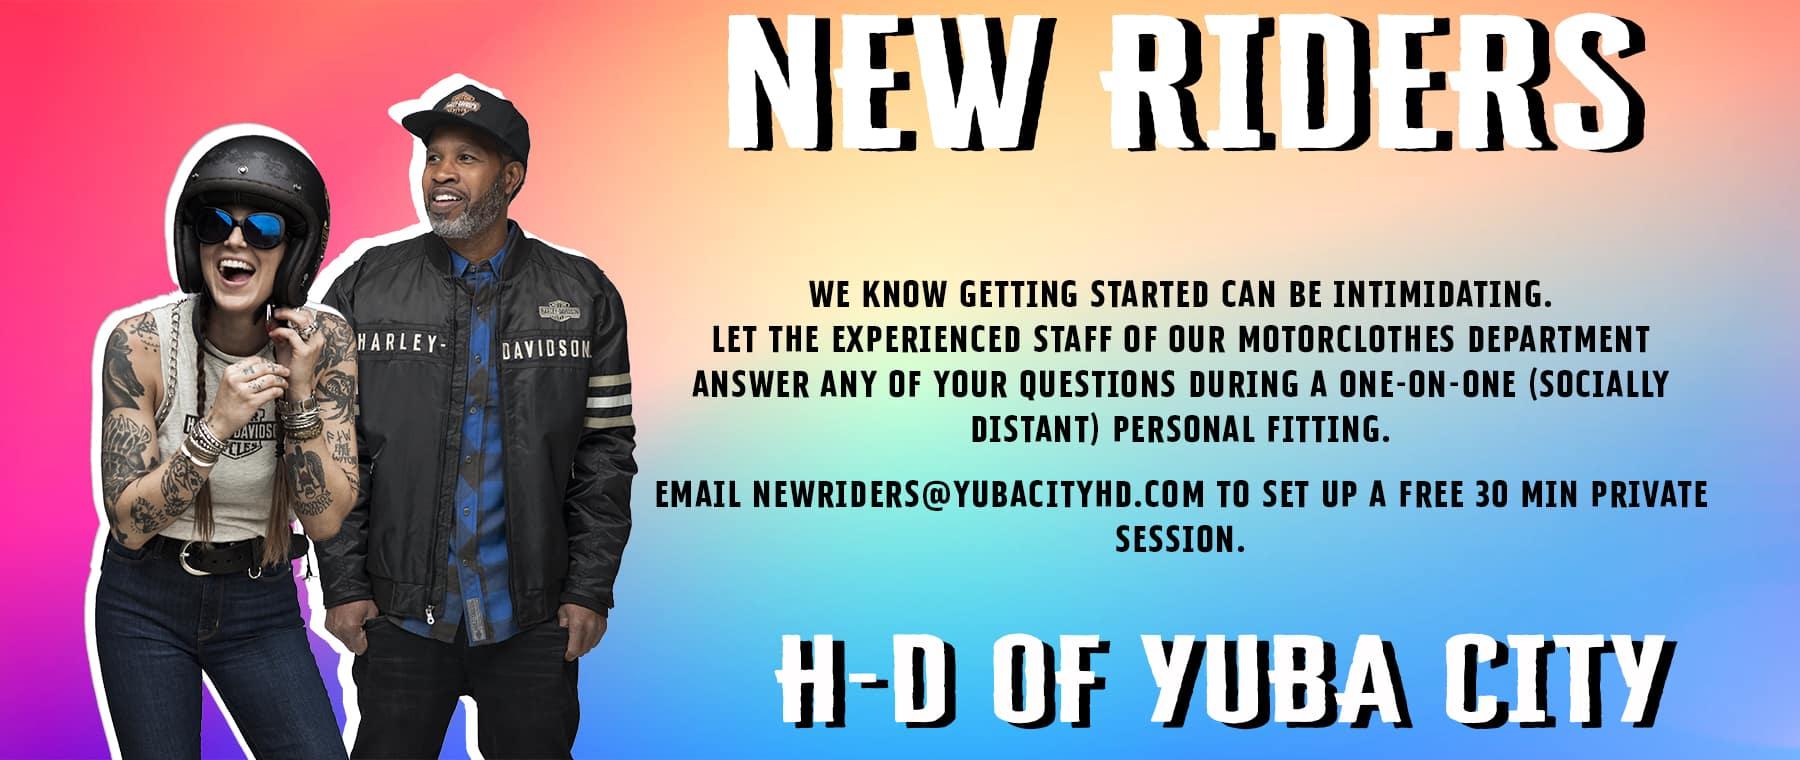 Website New Rider